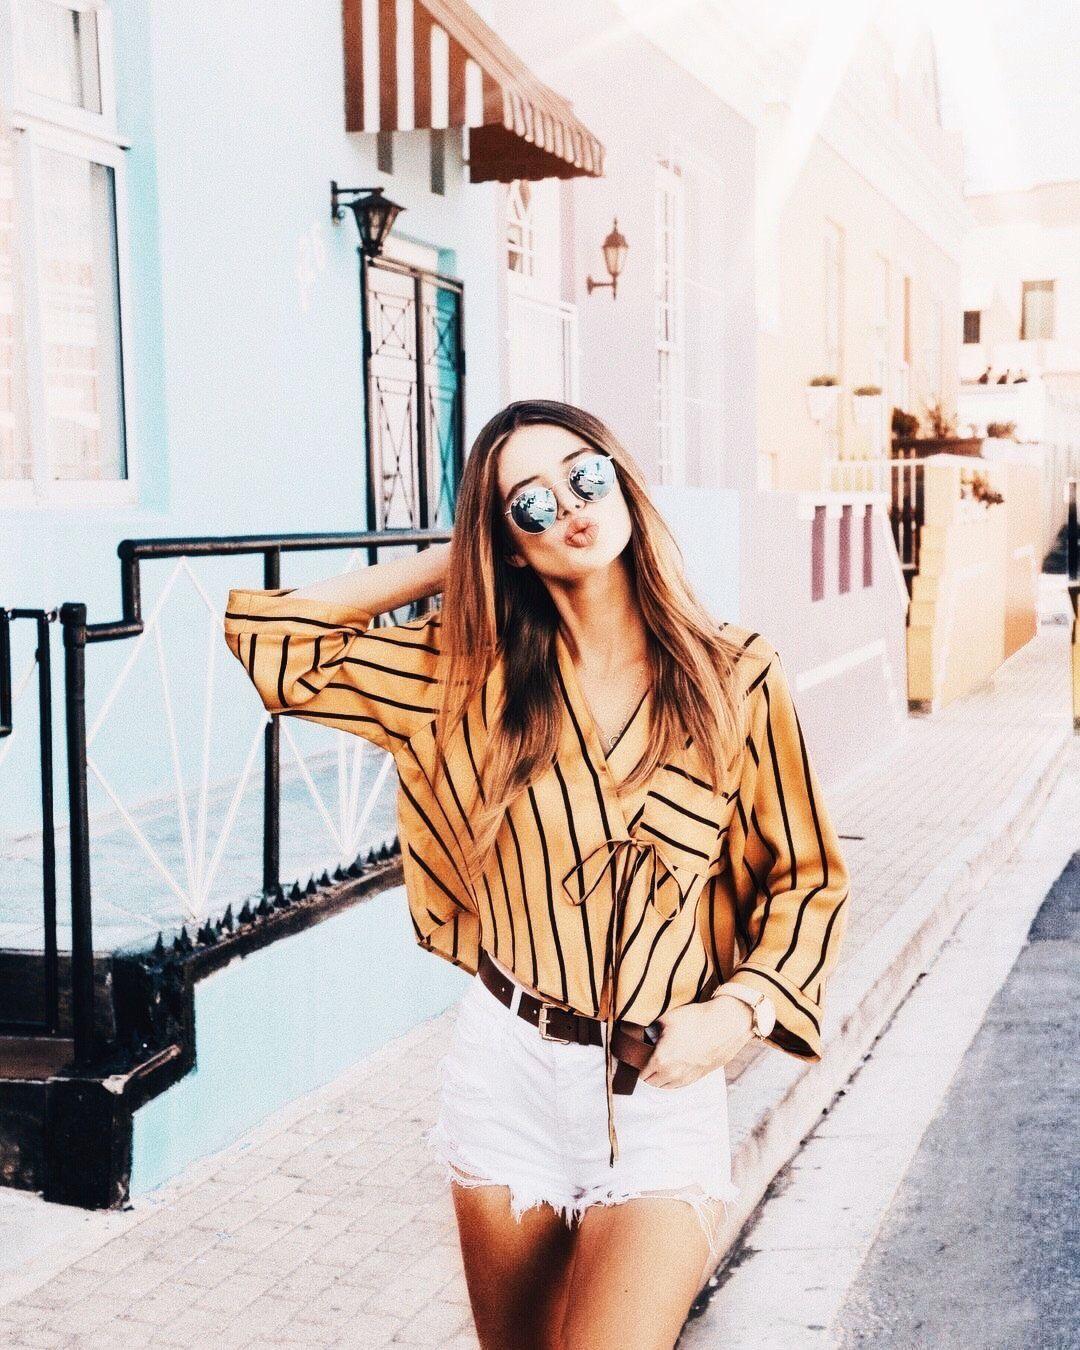 Summeroutfit Summerlook Summerfashion Vintagefashion Summer Ootd Summer Outfit Idea Summer Lookboo Fashion Blogger Poses Fashion Teenage Fashion Trending